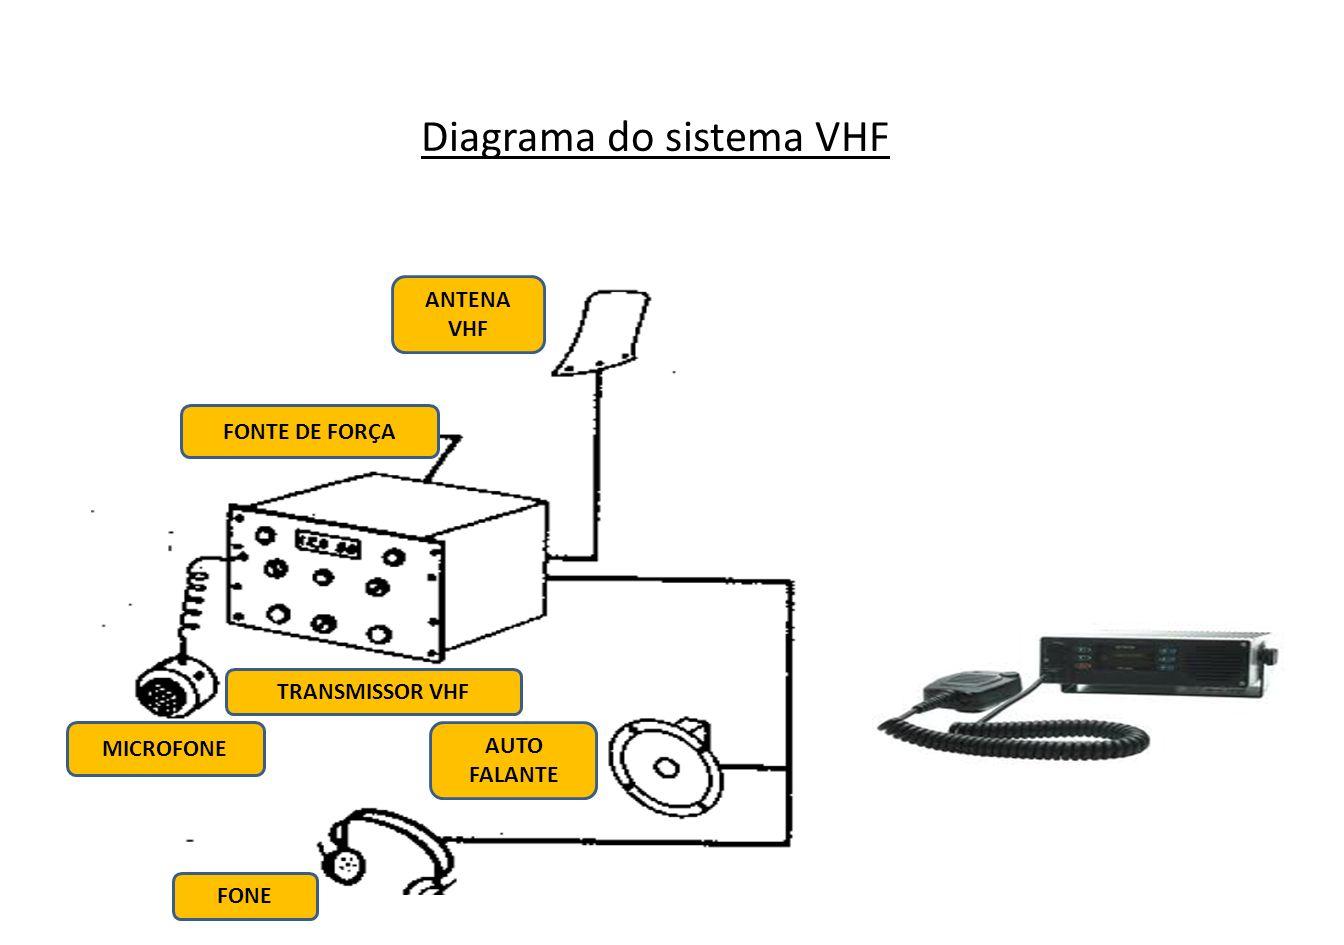 Diagrama do sistema VHF